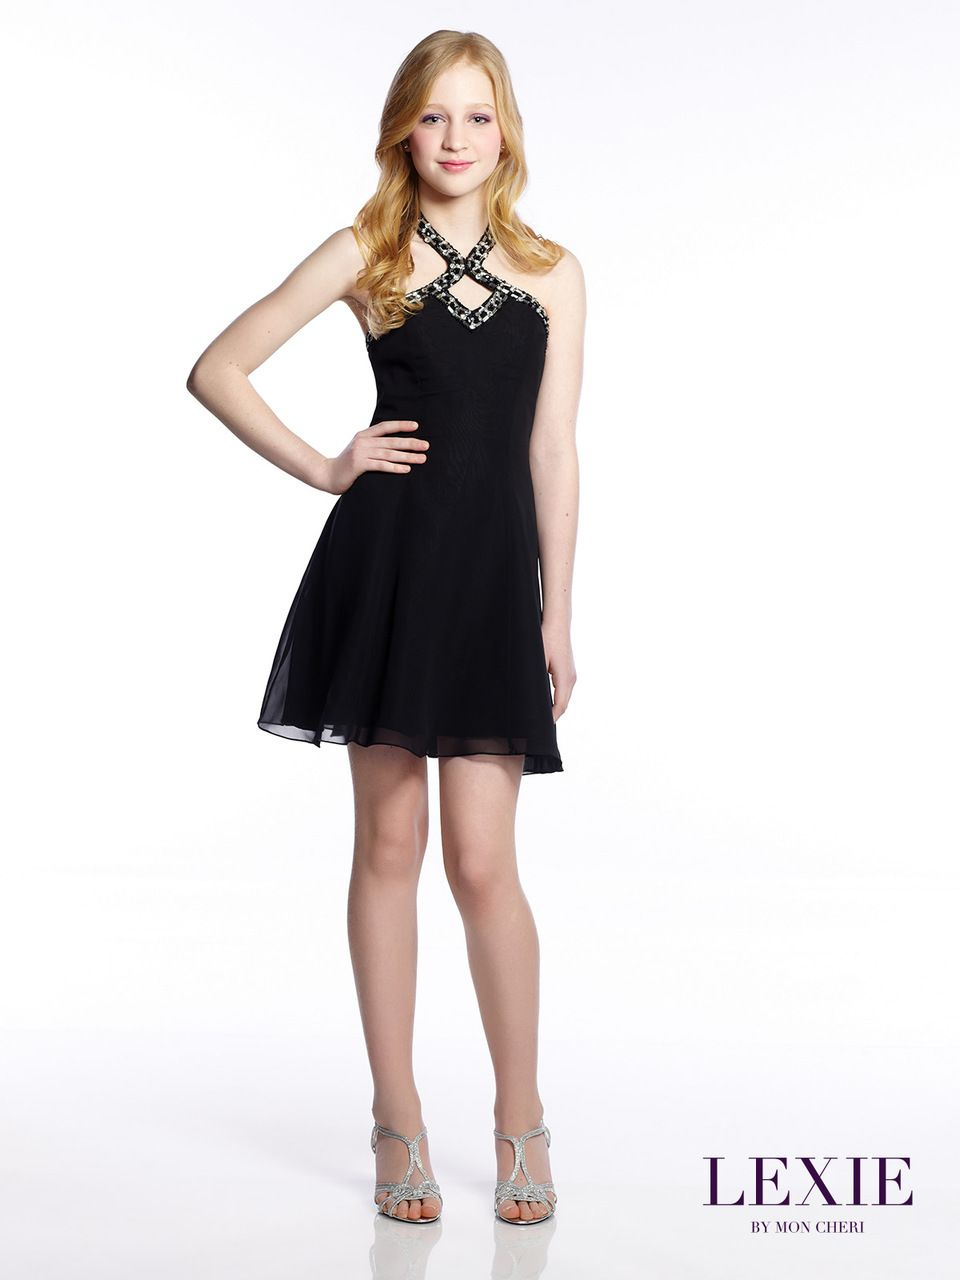 Girls party dress lexie by mon cheri dress for teens tw my